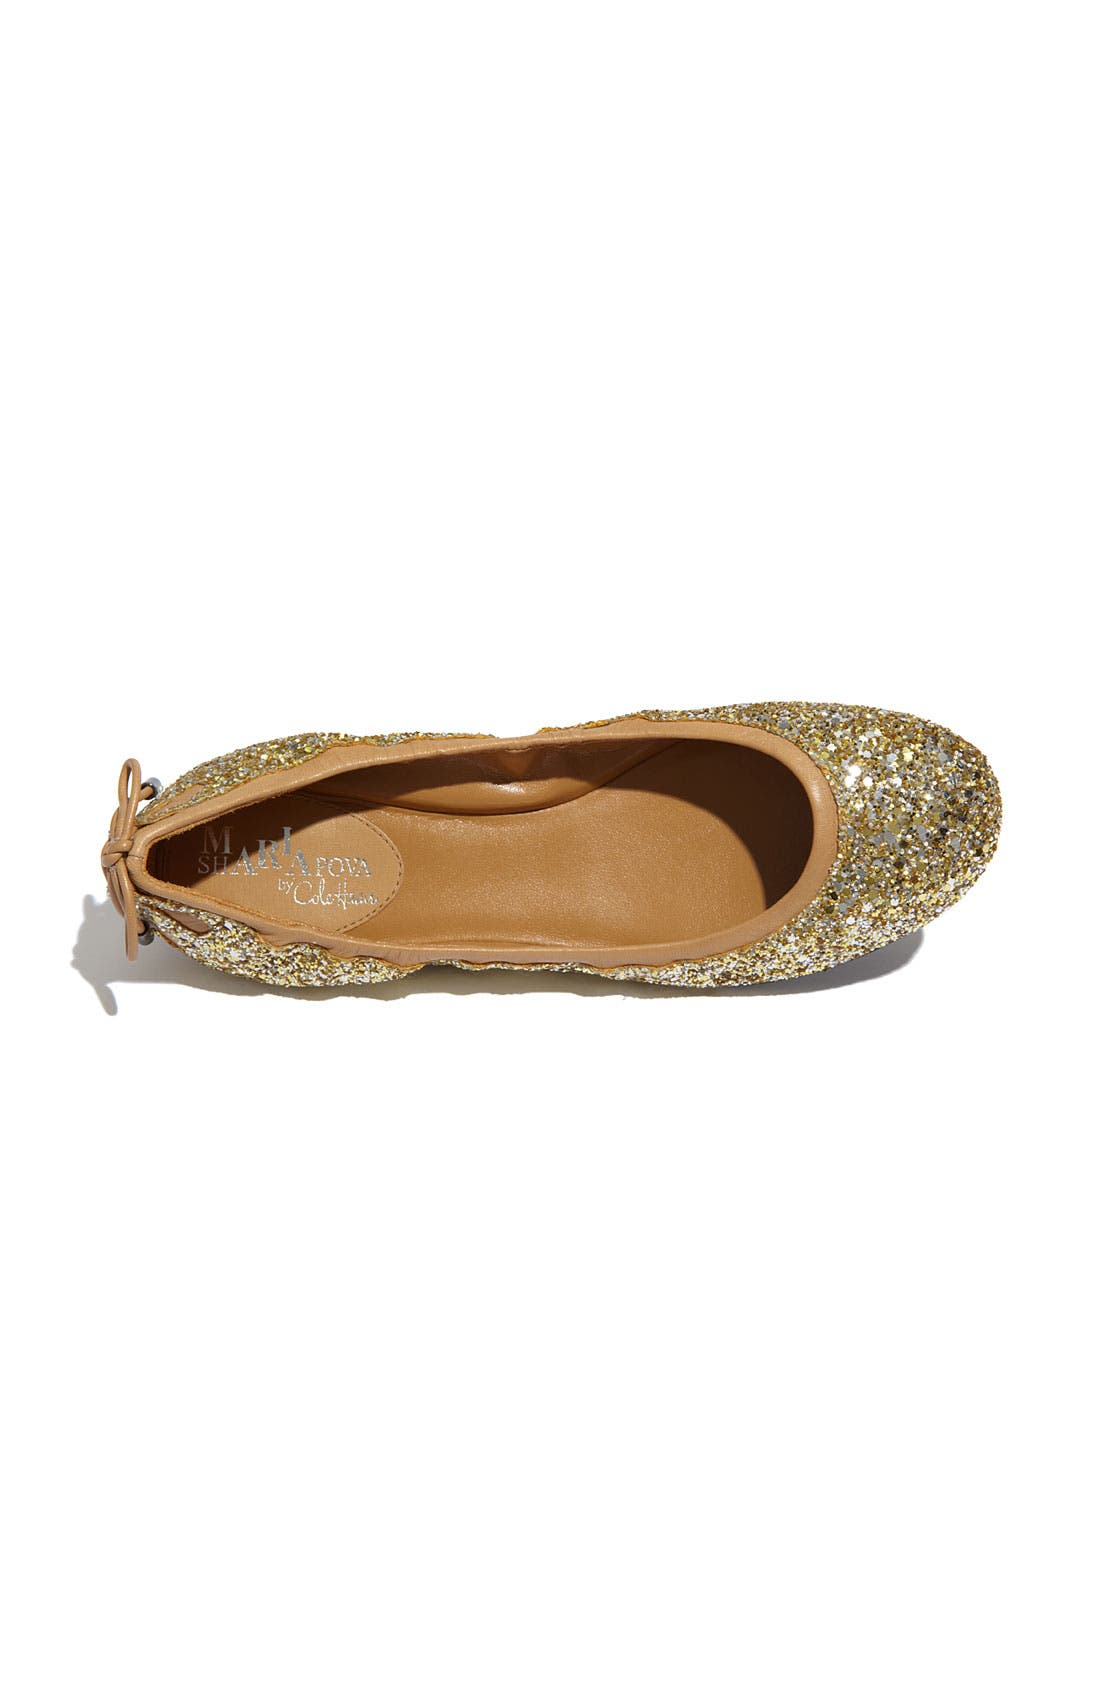 Alternate Image 3  - Maria Sharapova by Cole Haan 'Air Bacara' Ballet Flat